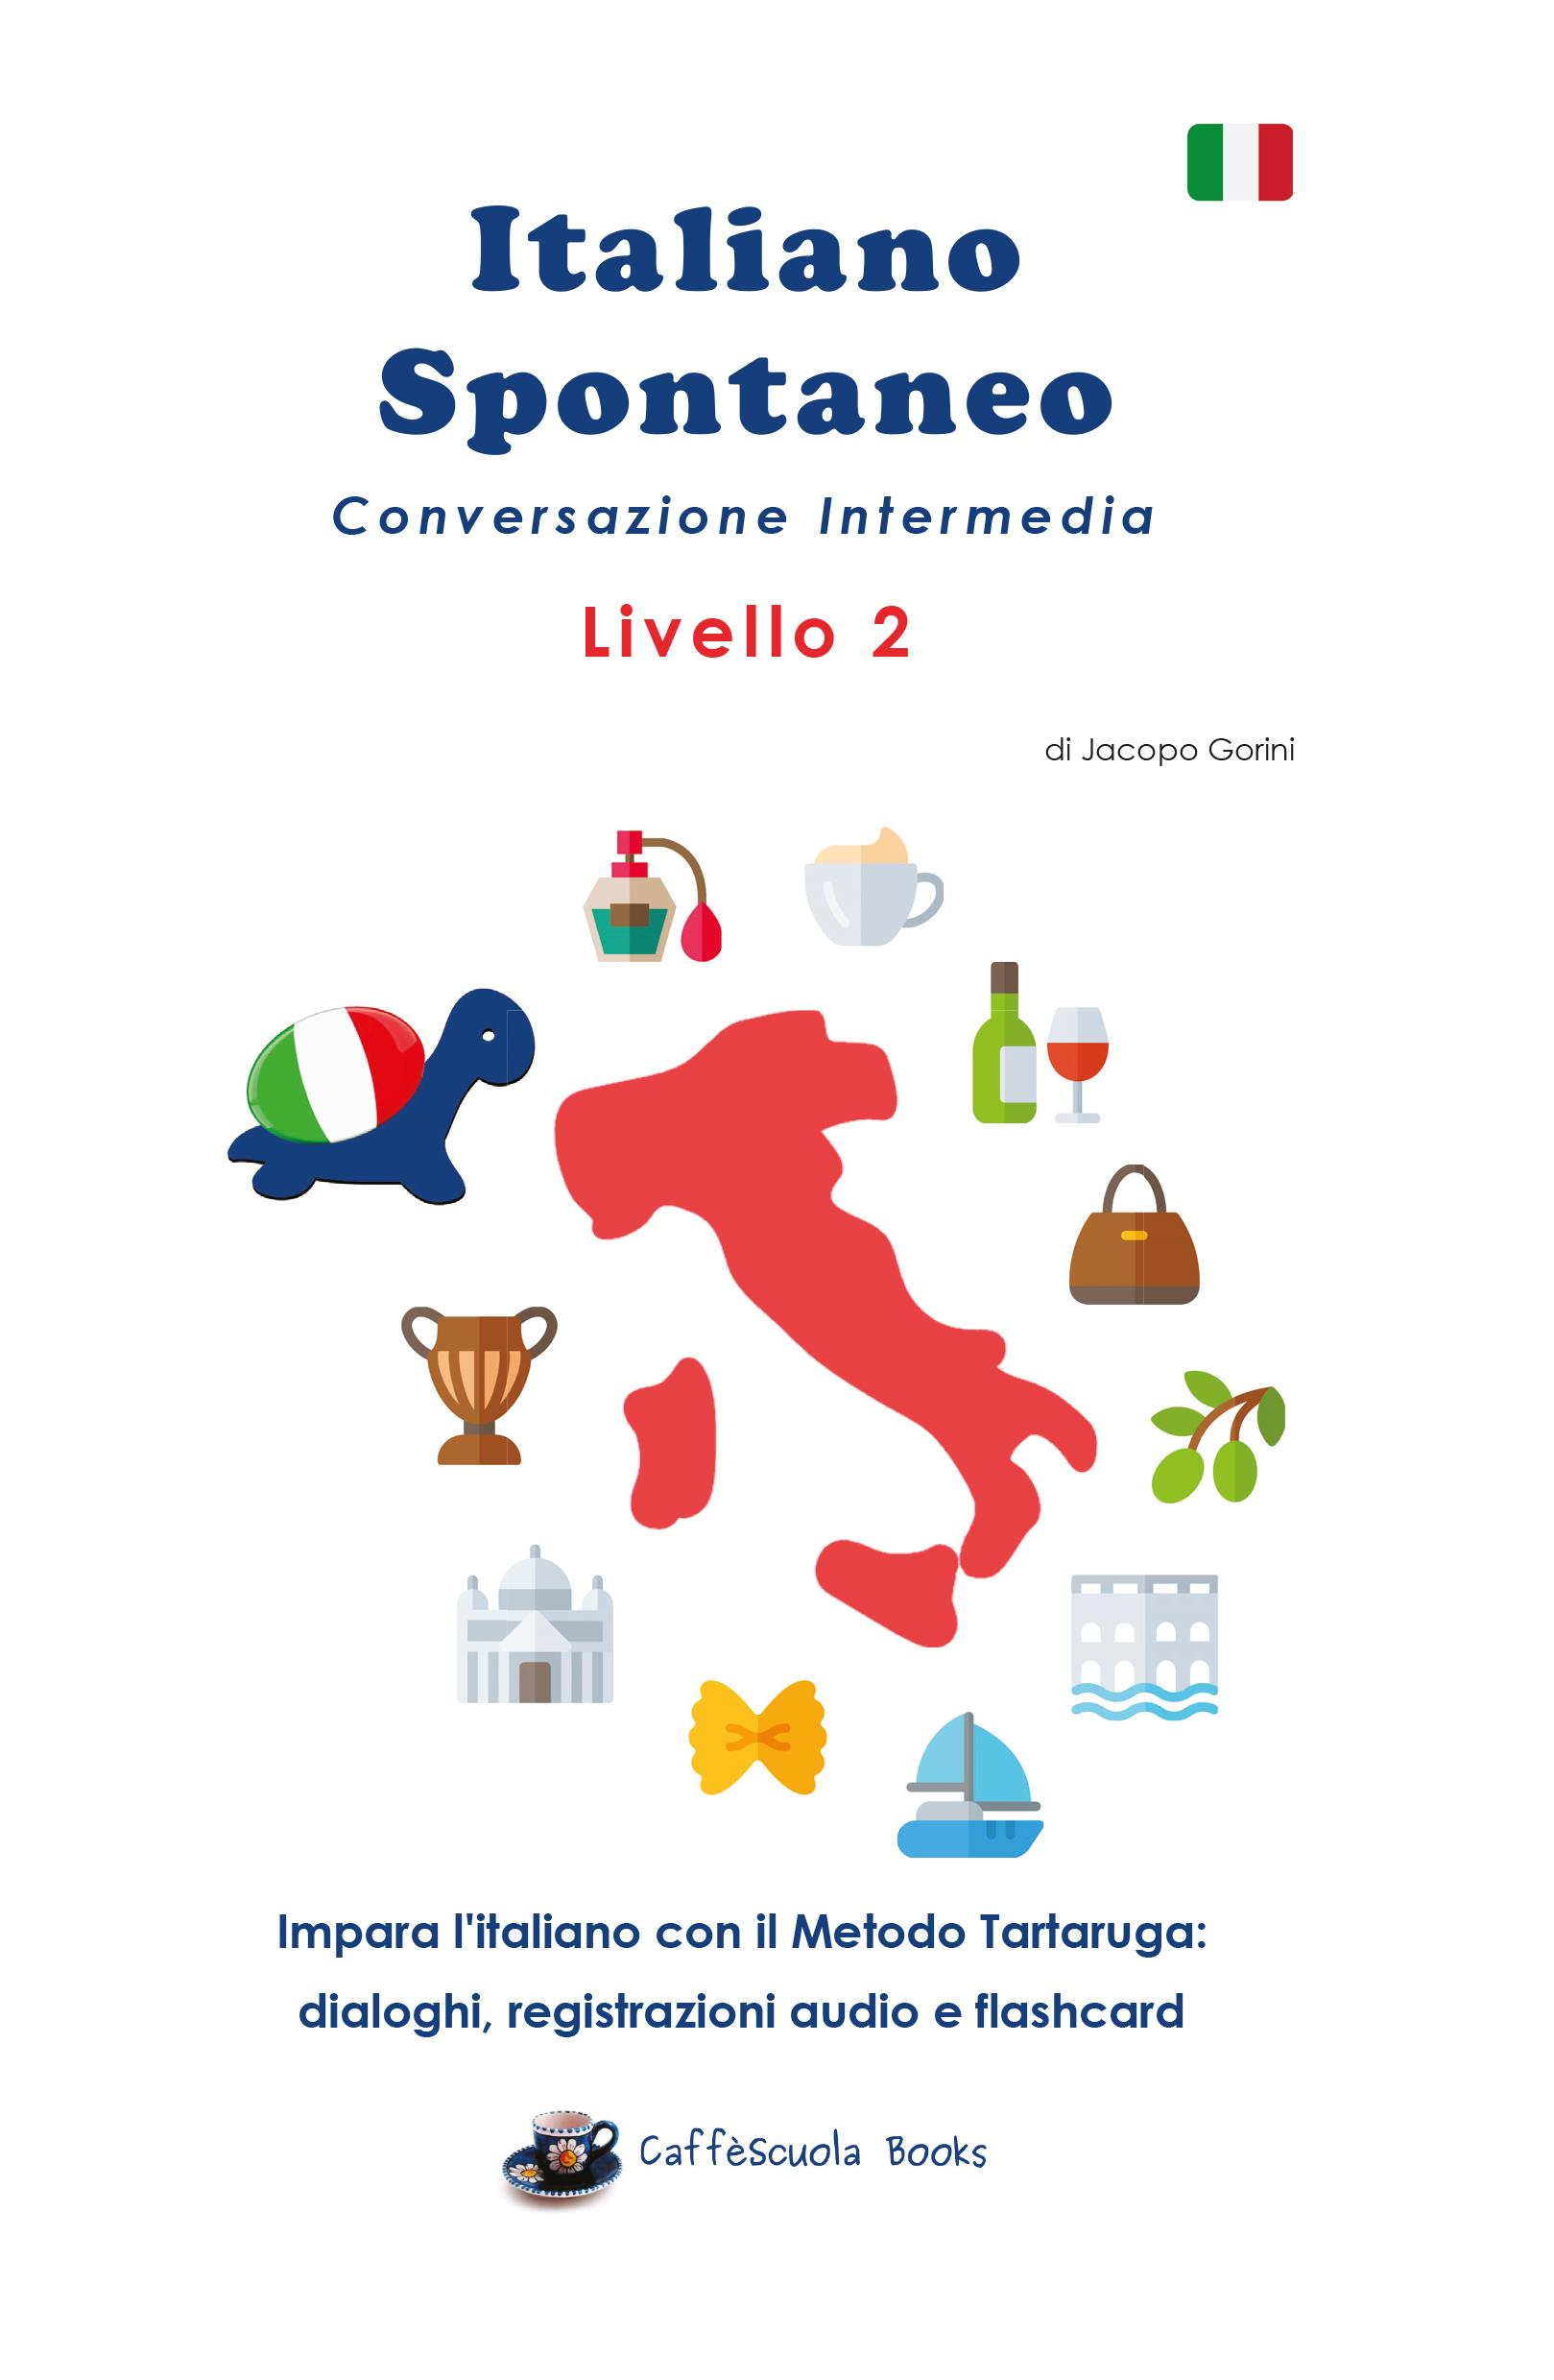 Italiano Spontaneo Livello 2